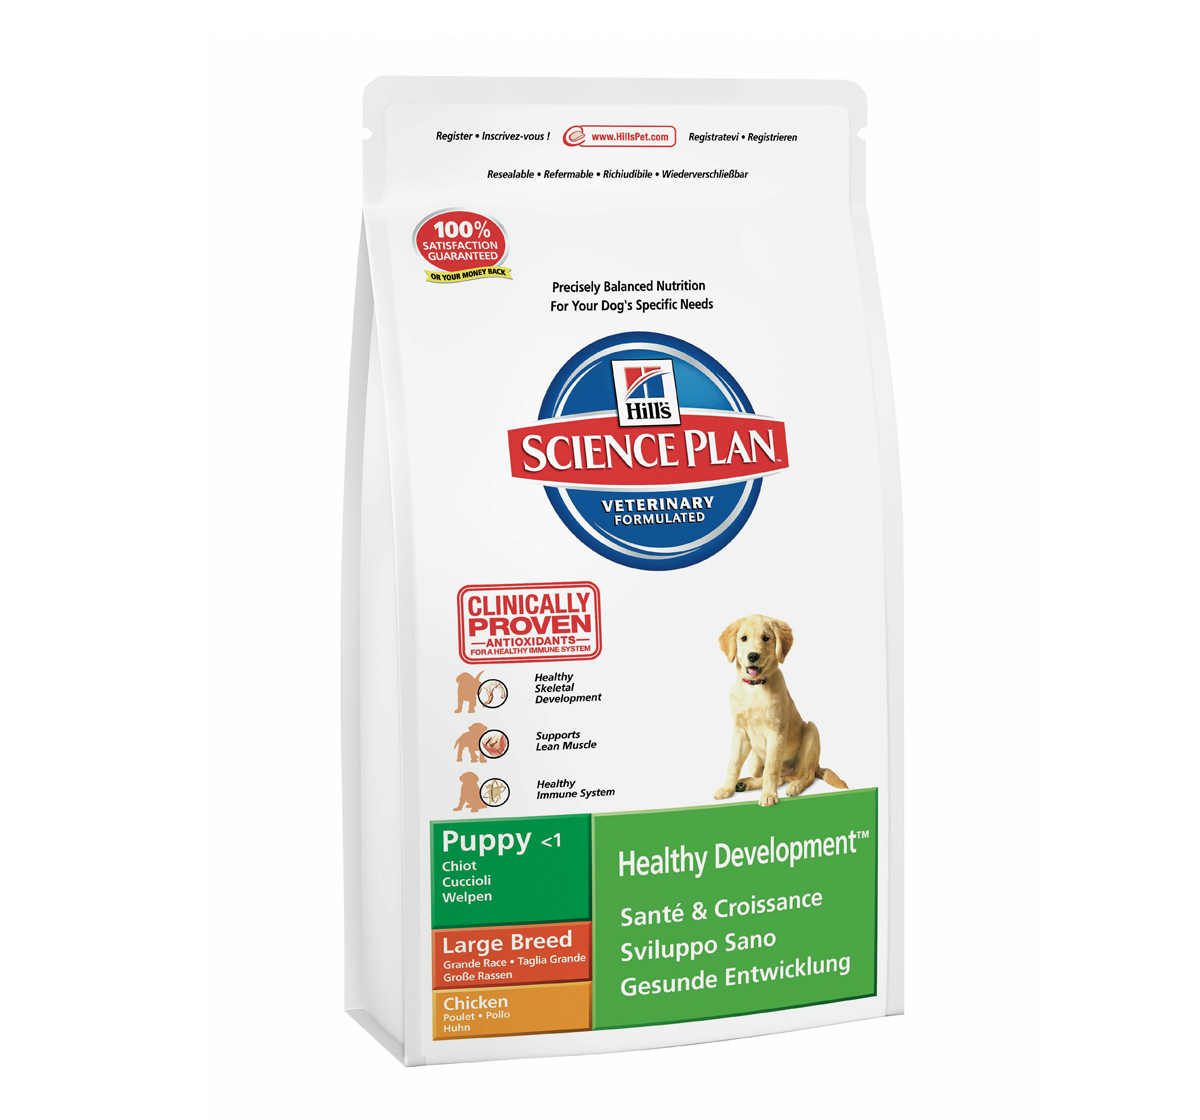 Hill's Science Plan Puppy сухой корм для щенков (с ягнёнком и рисом)